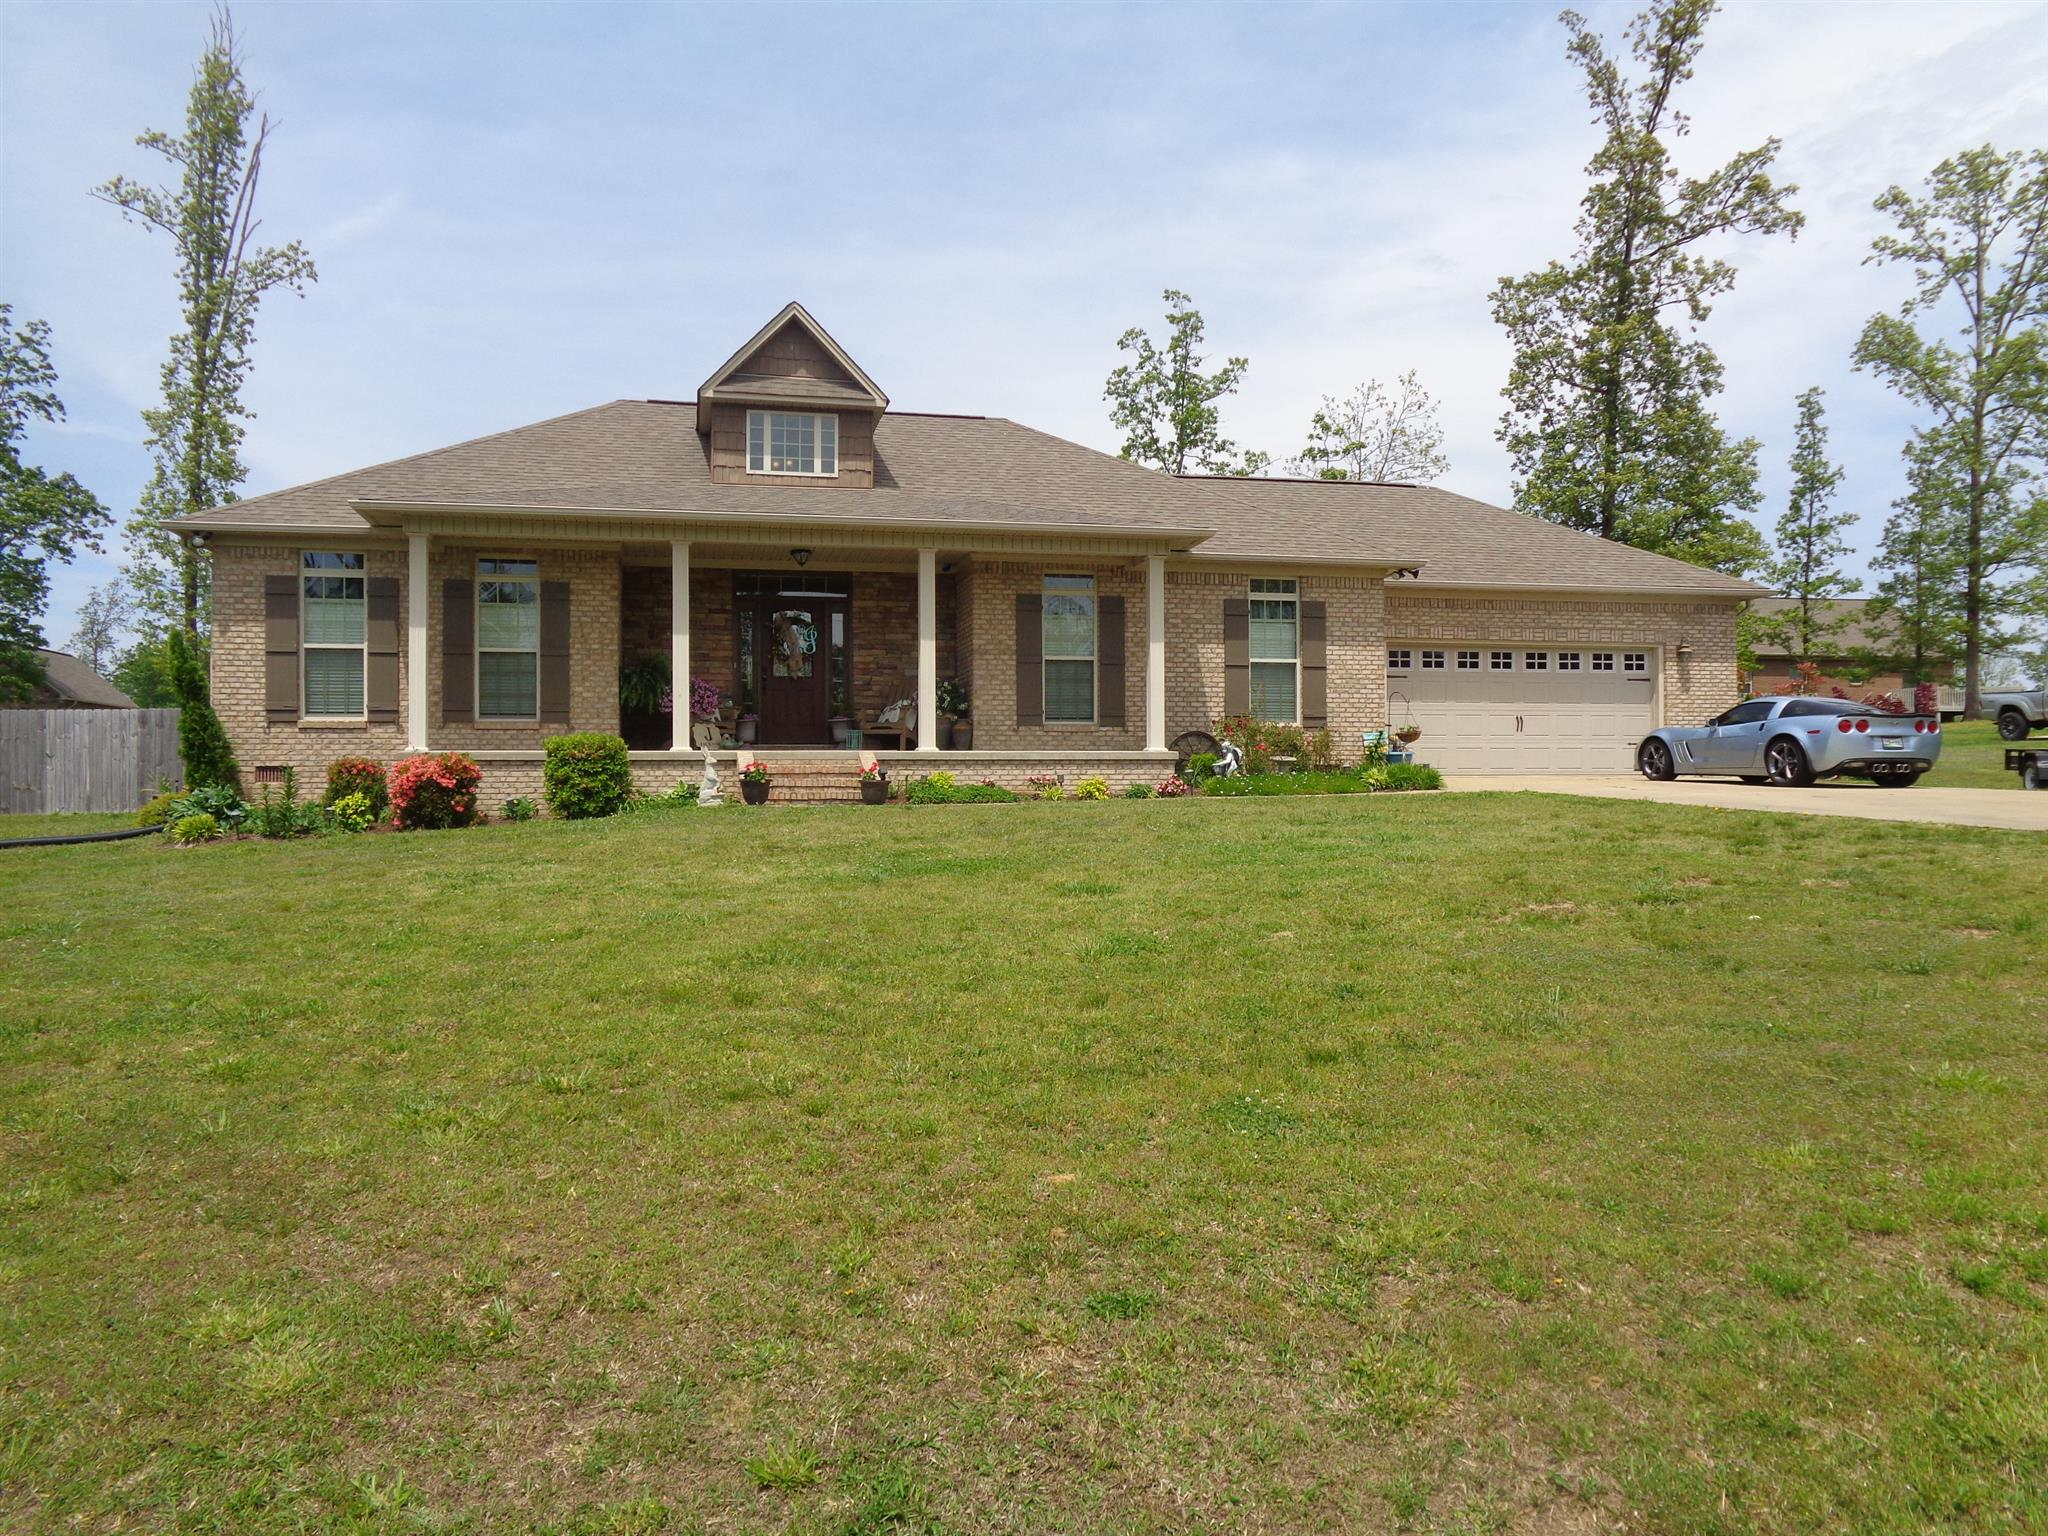 56 Chestnut Ln, Lawrenceburg, TN 38464 - Lawrenceburg, TN real estate listing